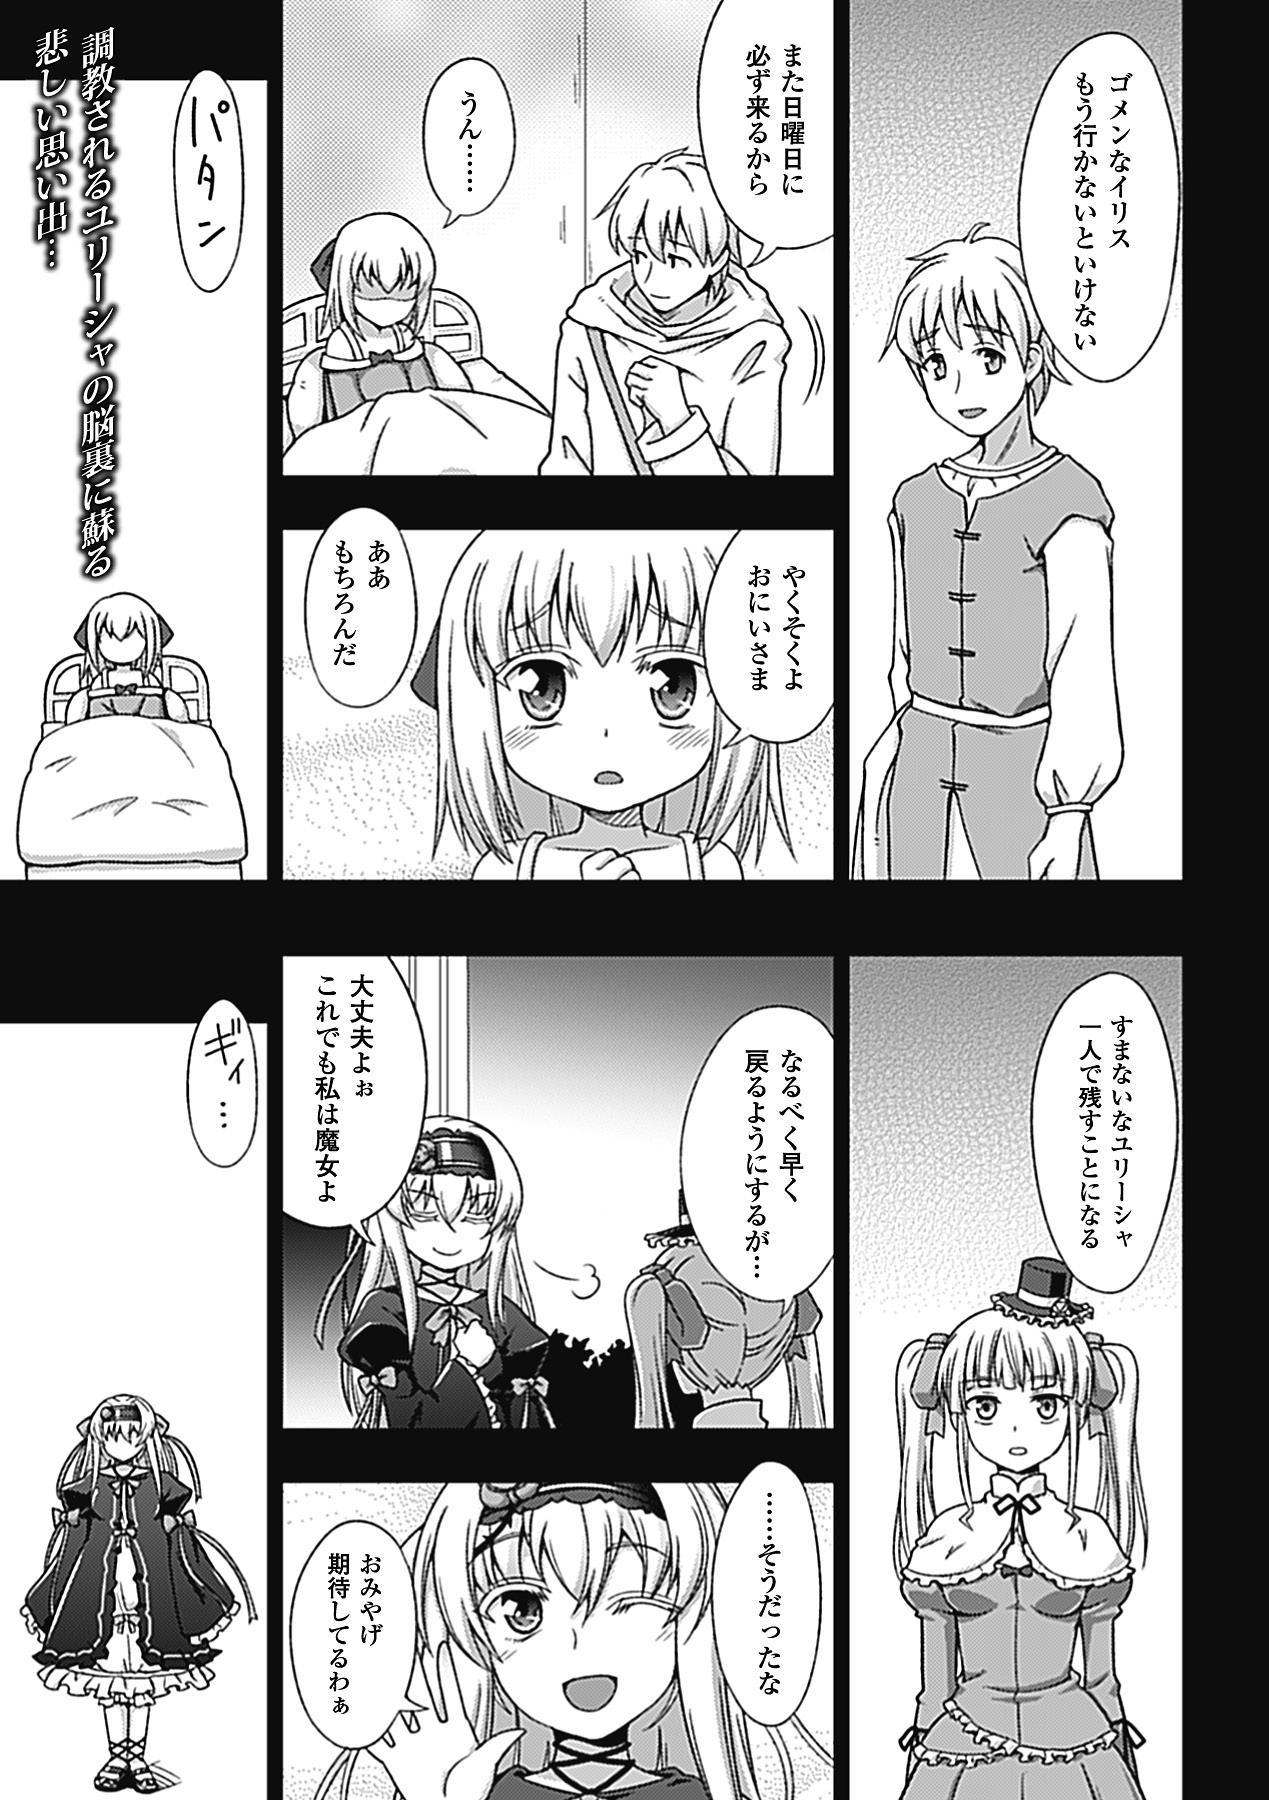 Megami Crisis 1 23